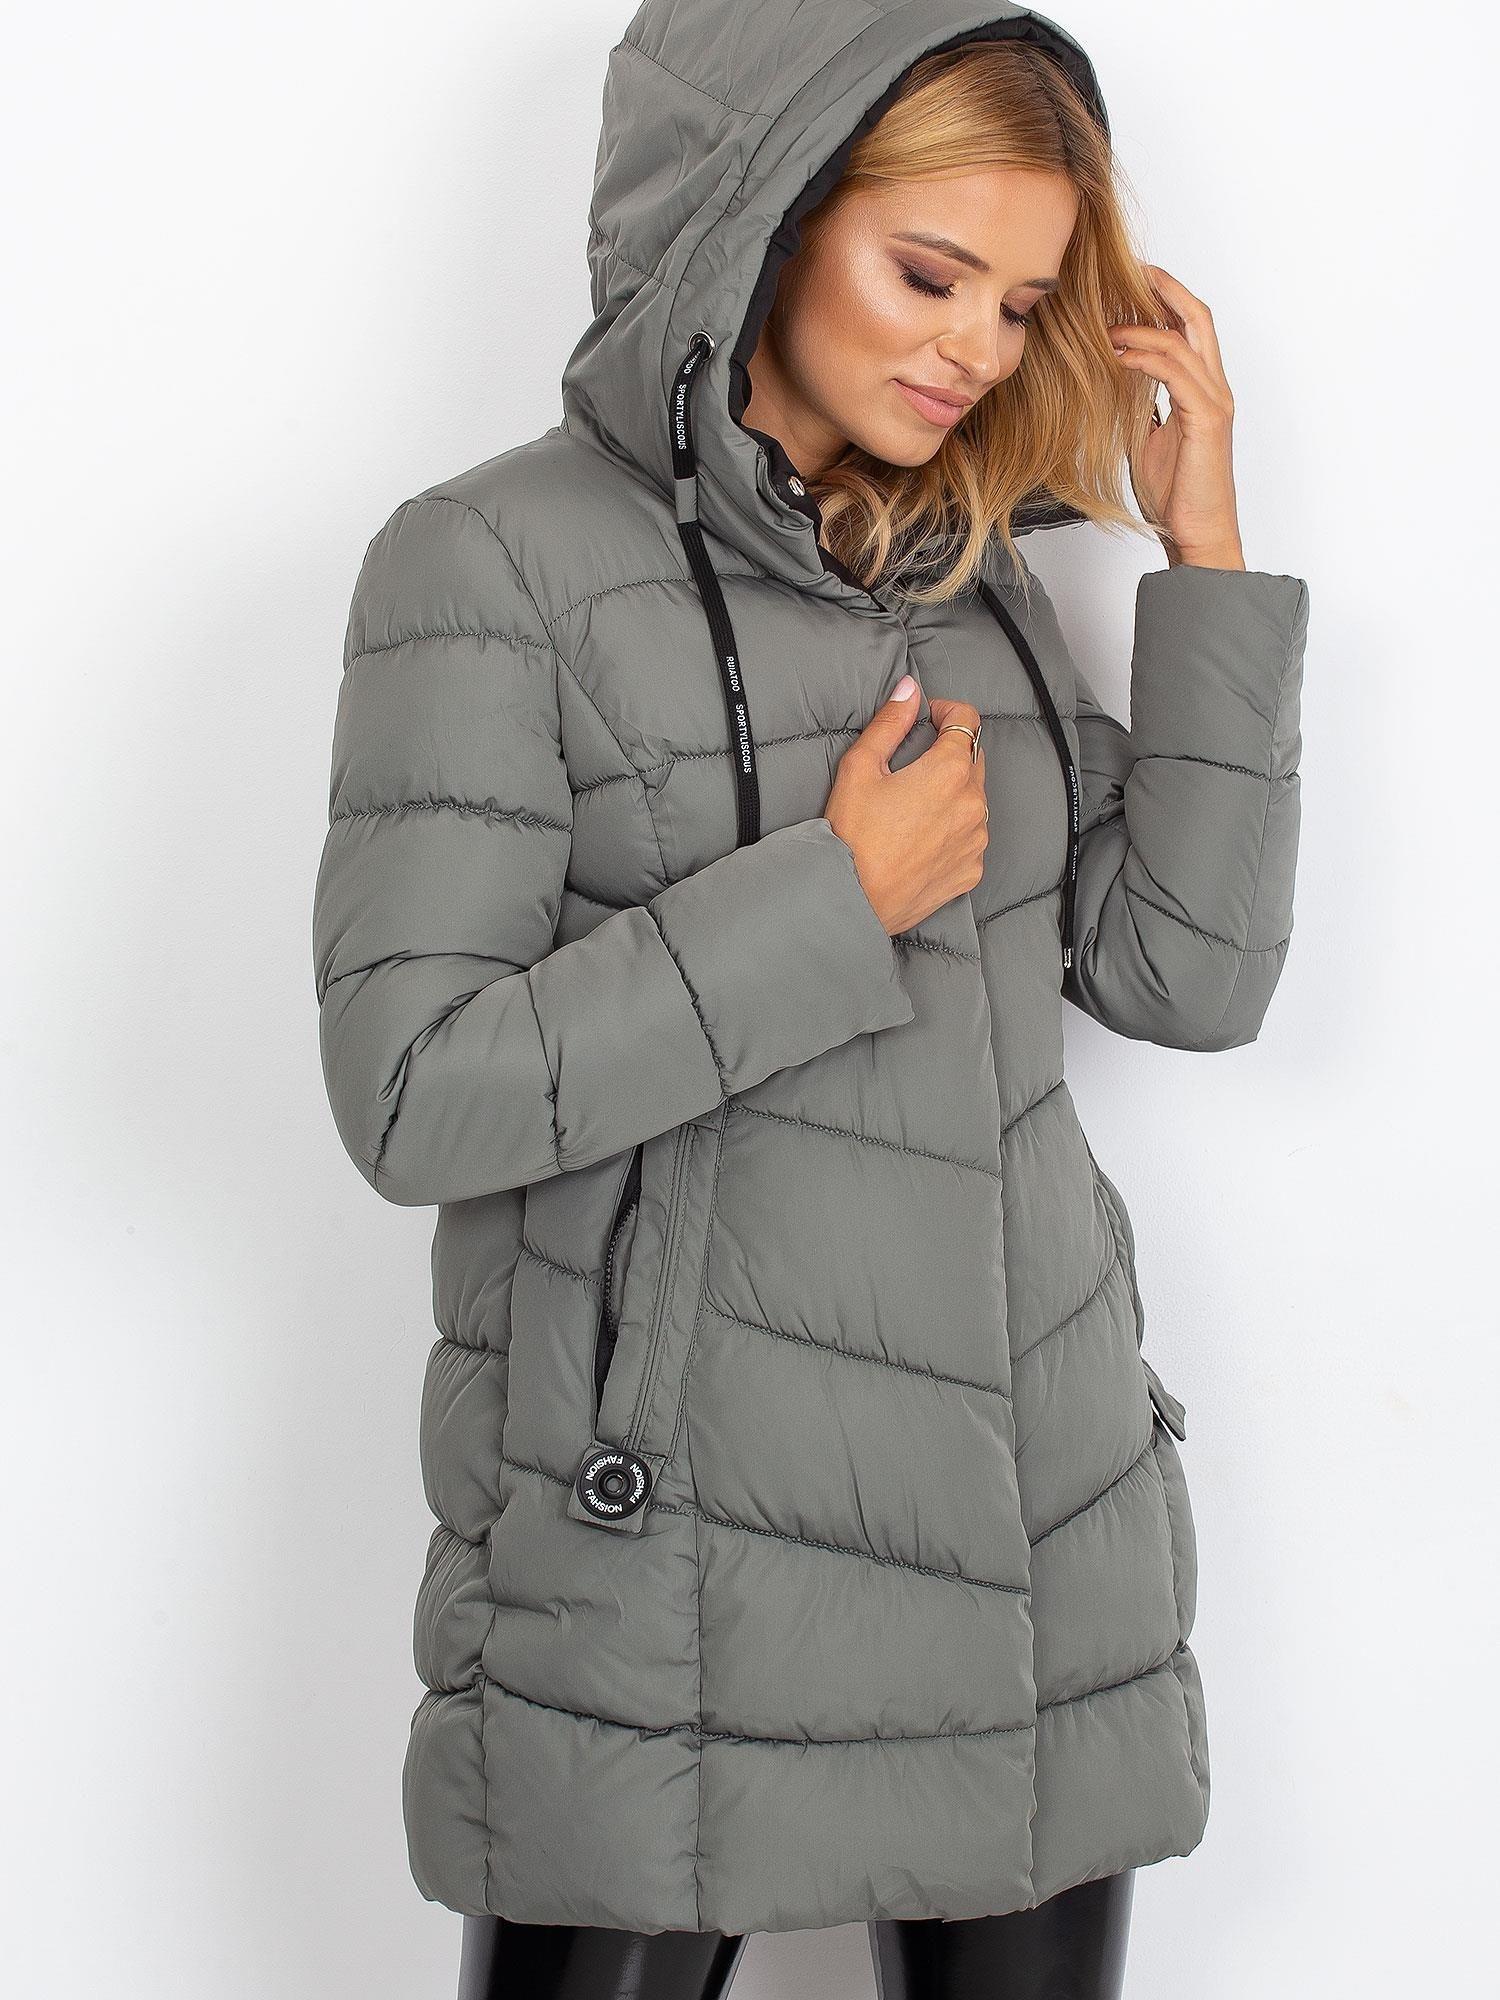 Damskie kurtki zimowe